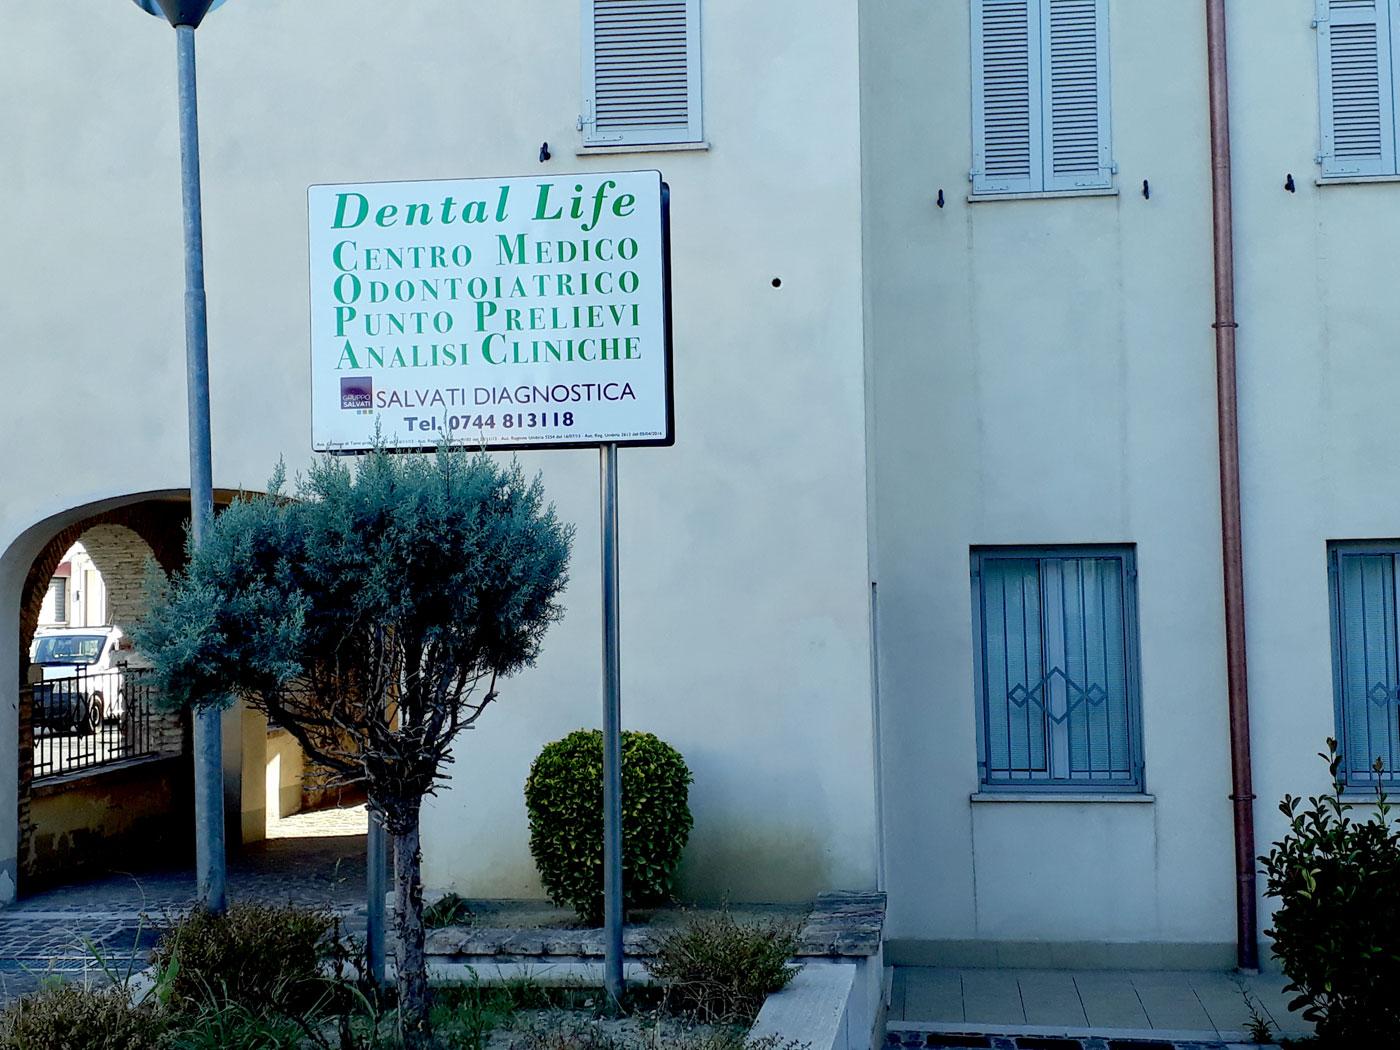 Centro Medico Odontoiatrico